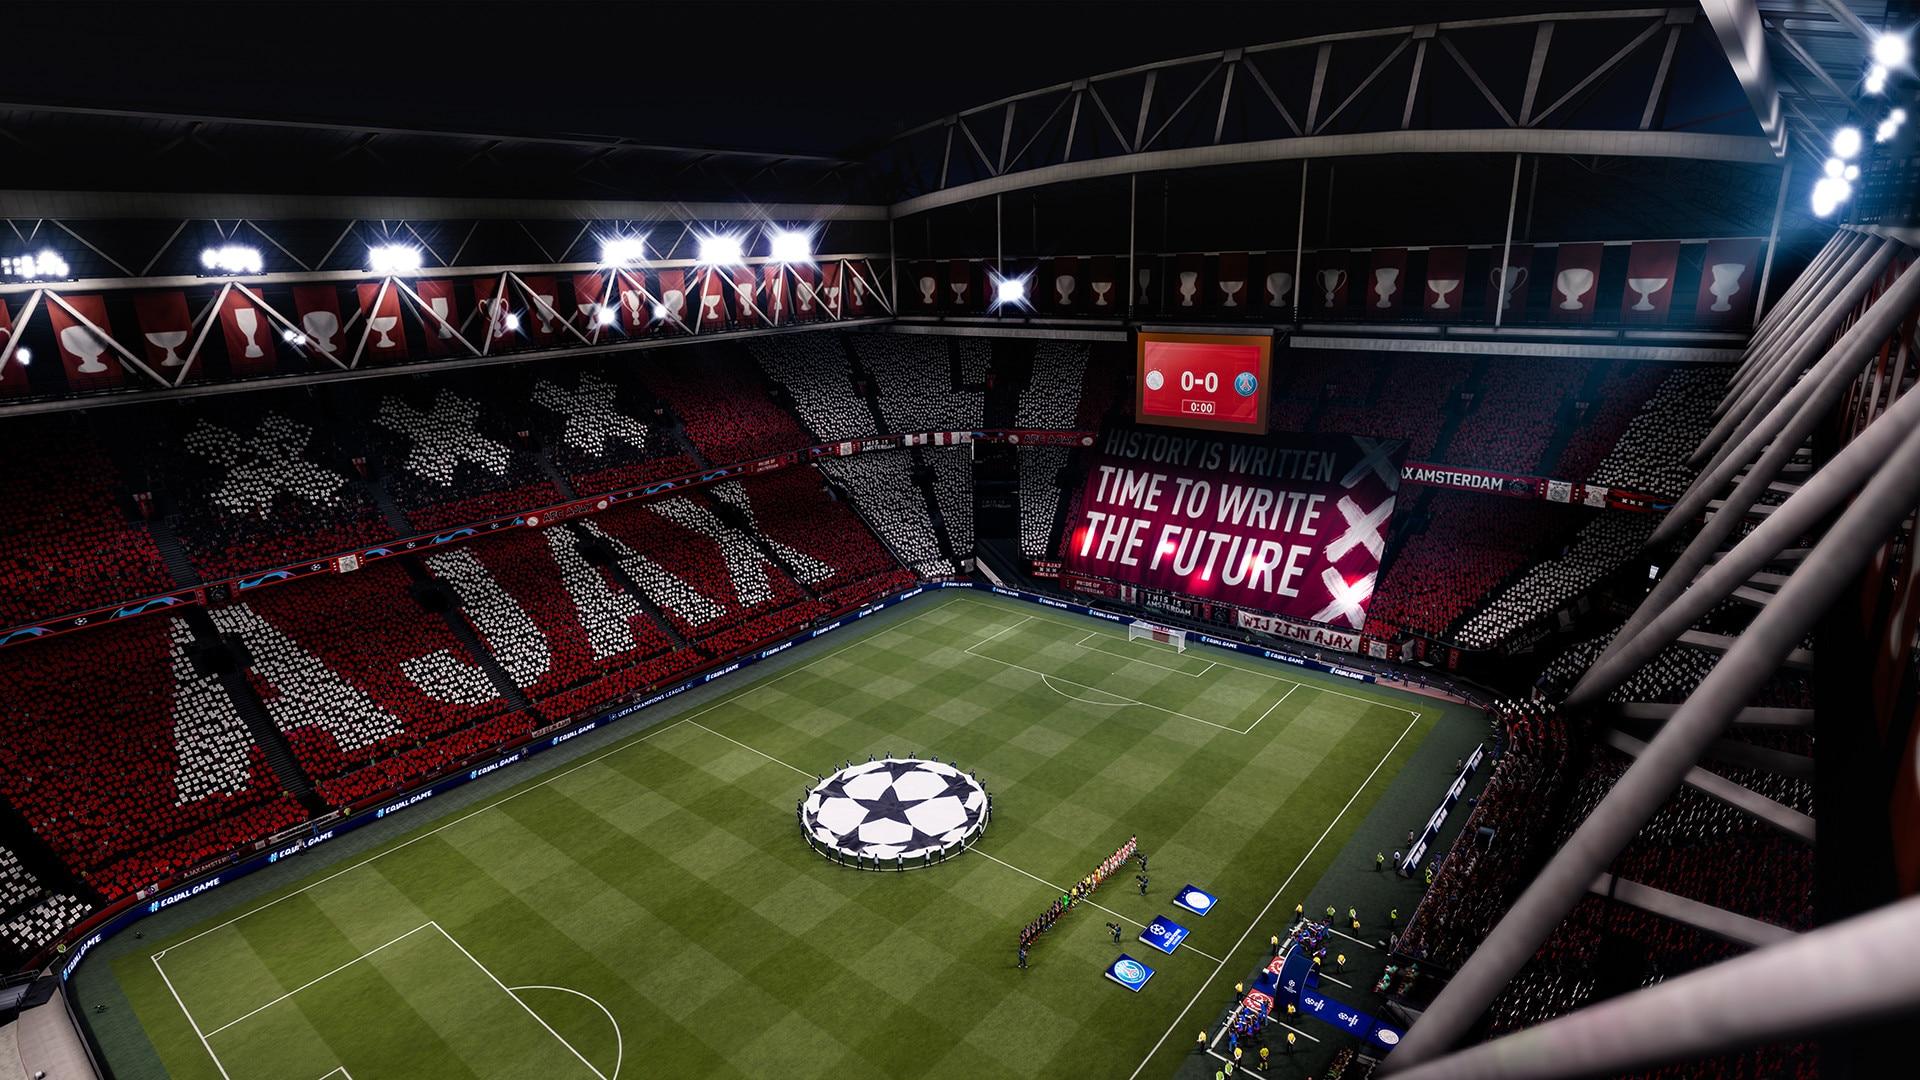 EA SPORTS FIFA 21 (PC) - Origin Key - GLOBAL (EN/PL/CZ/TR/RU) - 4